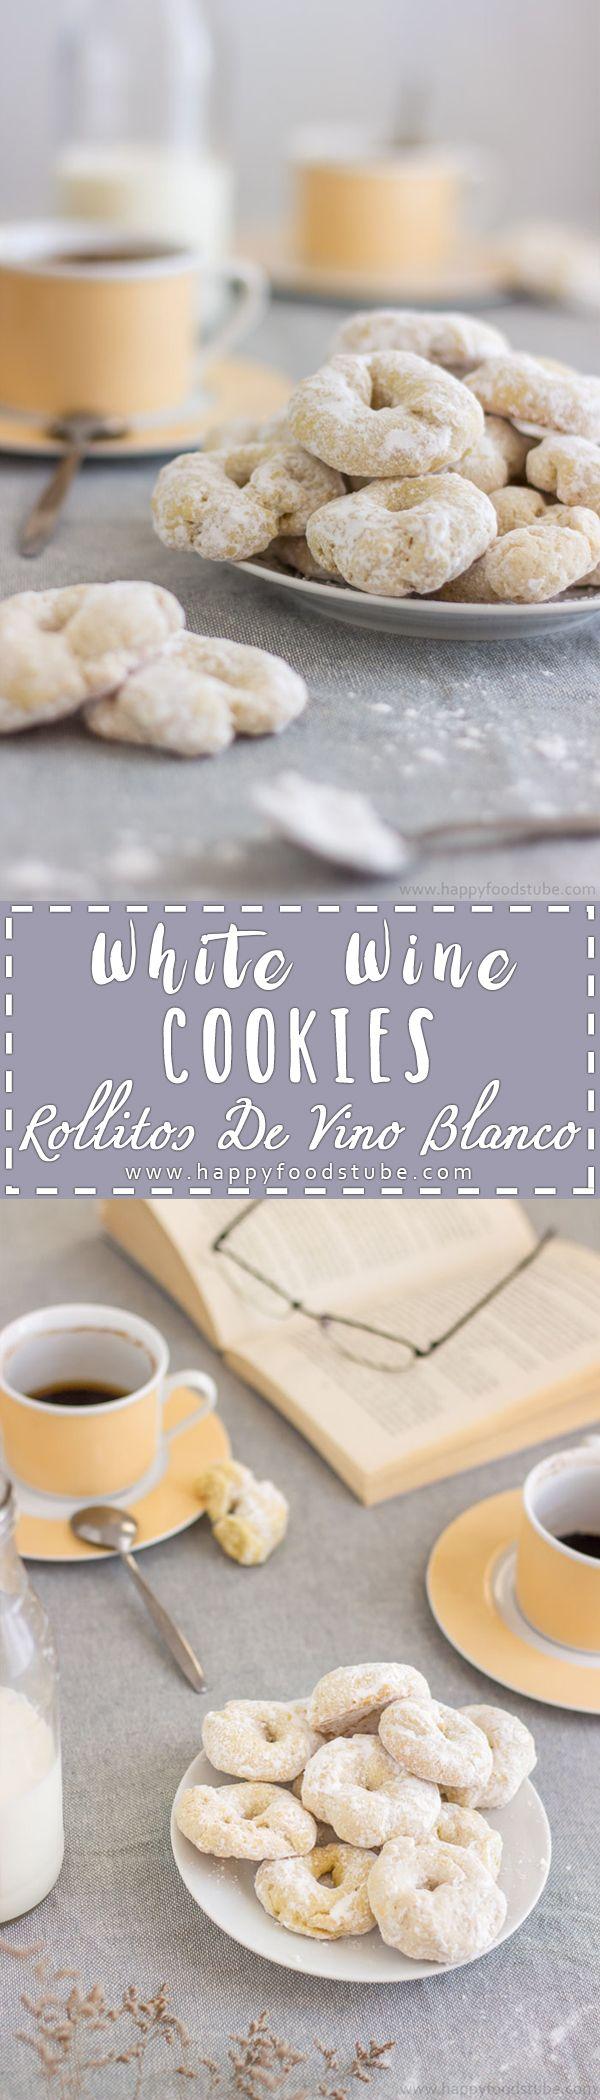 White Wine Cookies - Rollitos de Vino Blanco are delicious sweet treats! Homemade Spanish dessert recipe   happyfoodstube.com